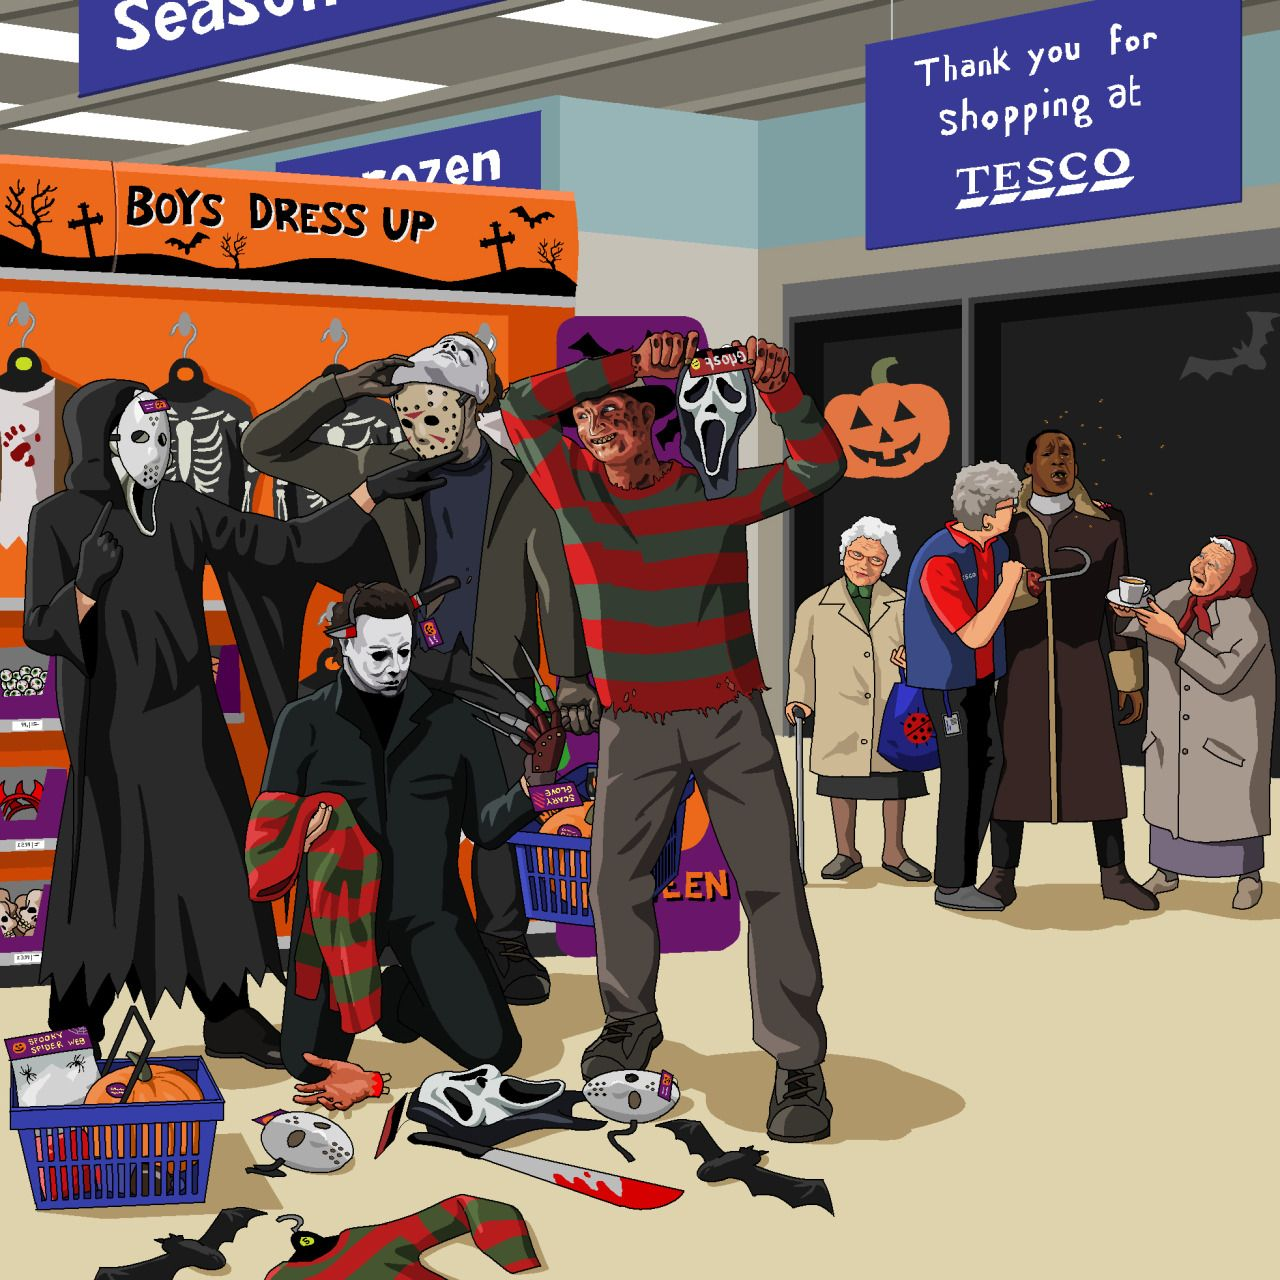 Halloween Jason Mask Cartoon.Freddy Jason Michael Myers And Ghostface In Tesco Ransacking The